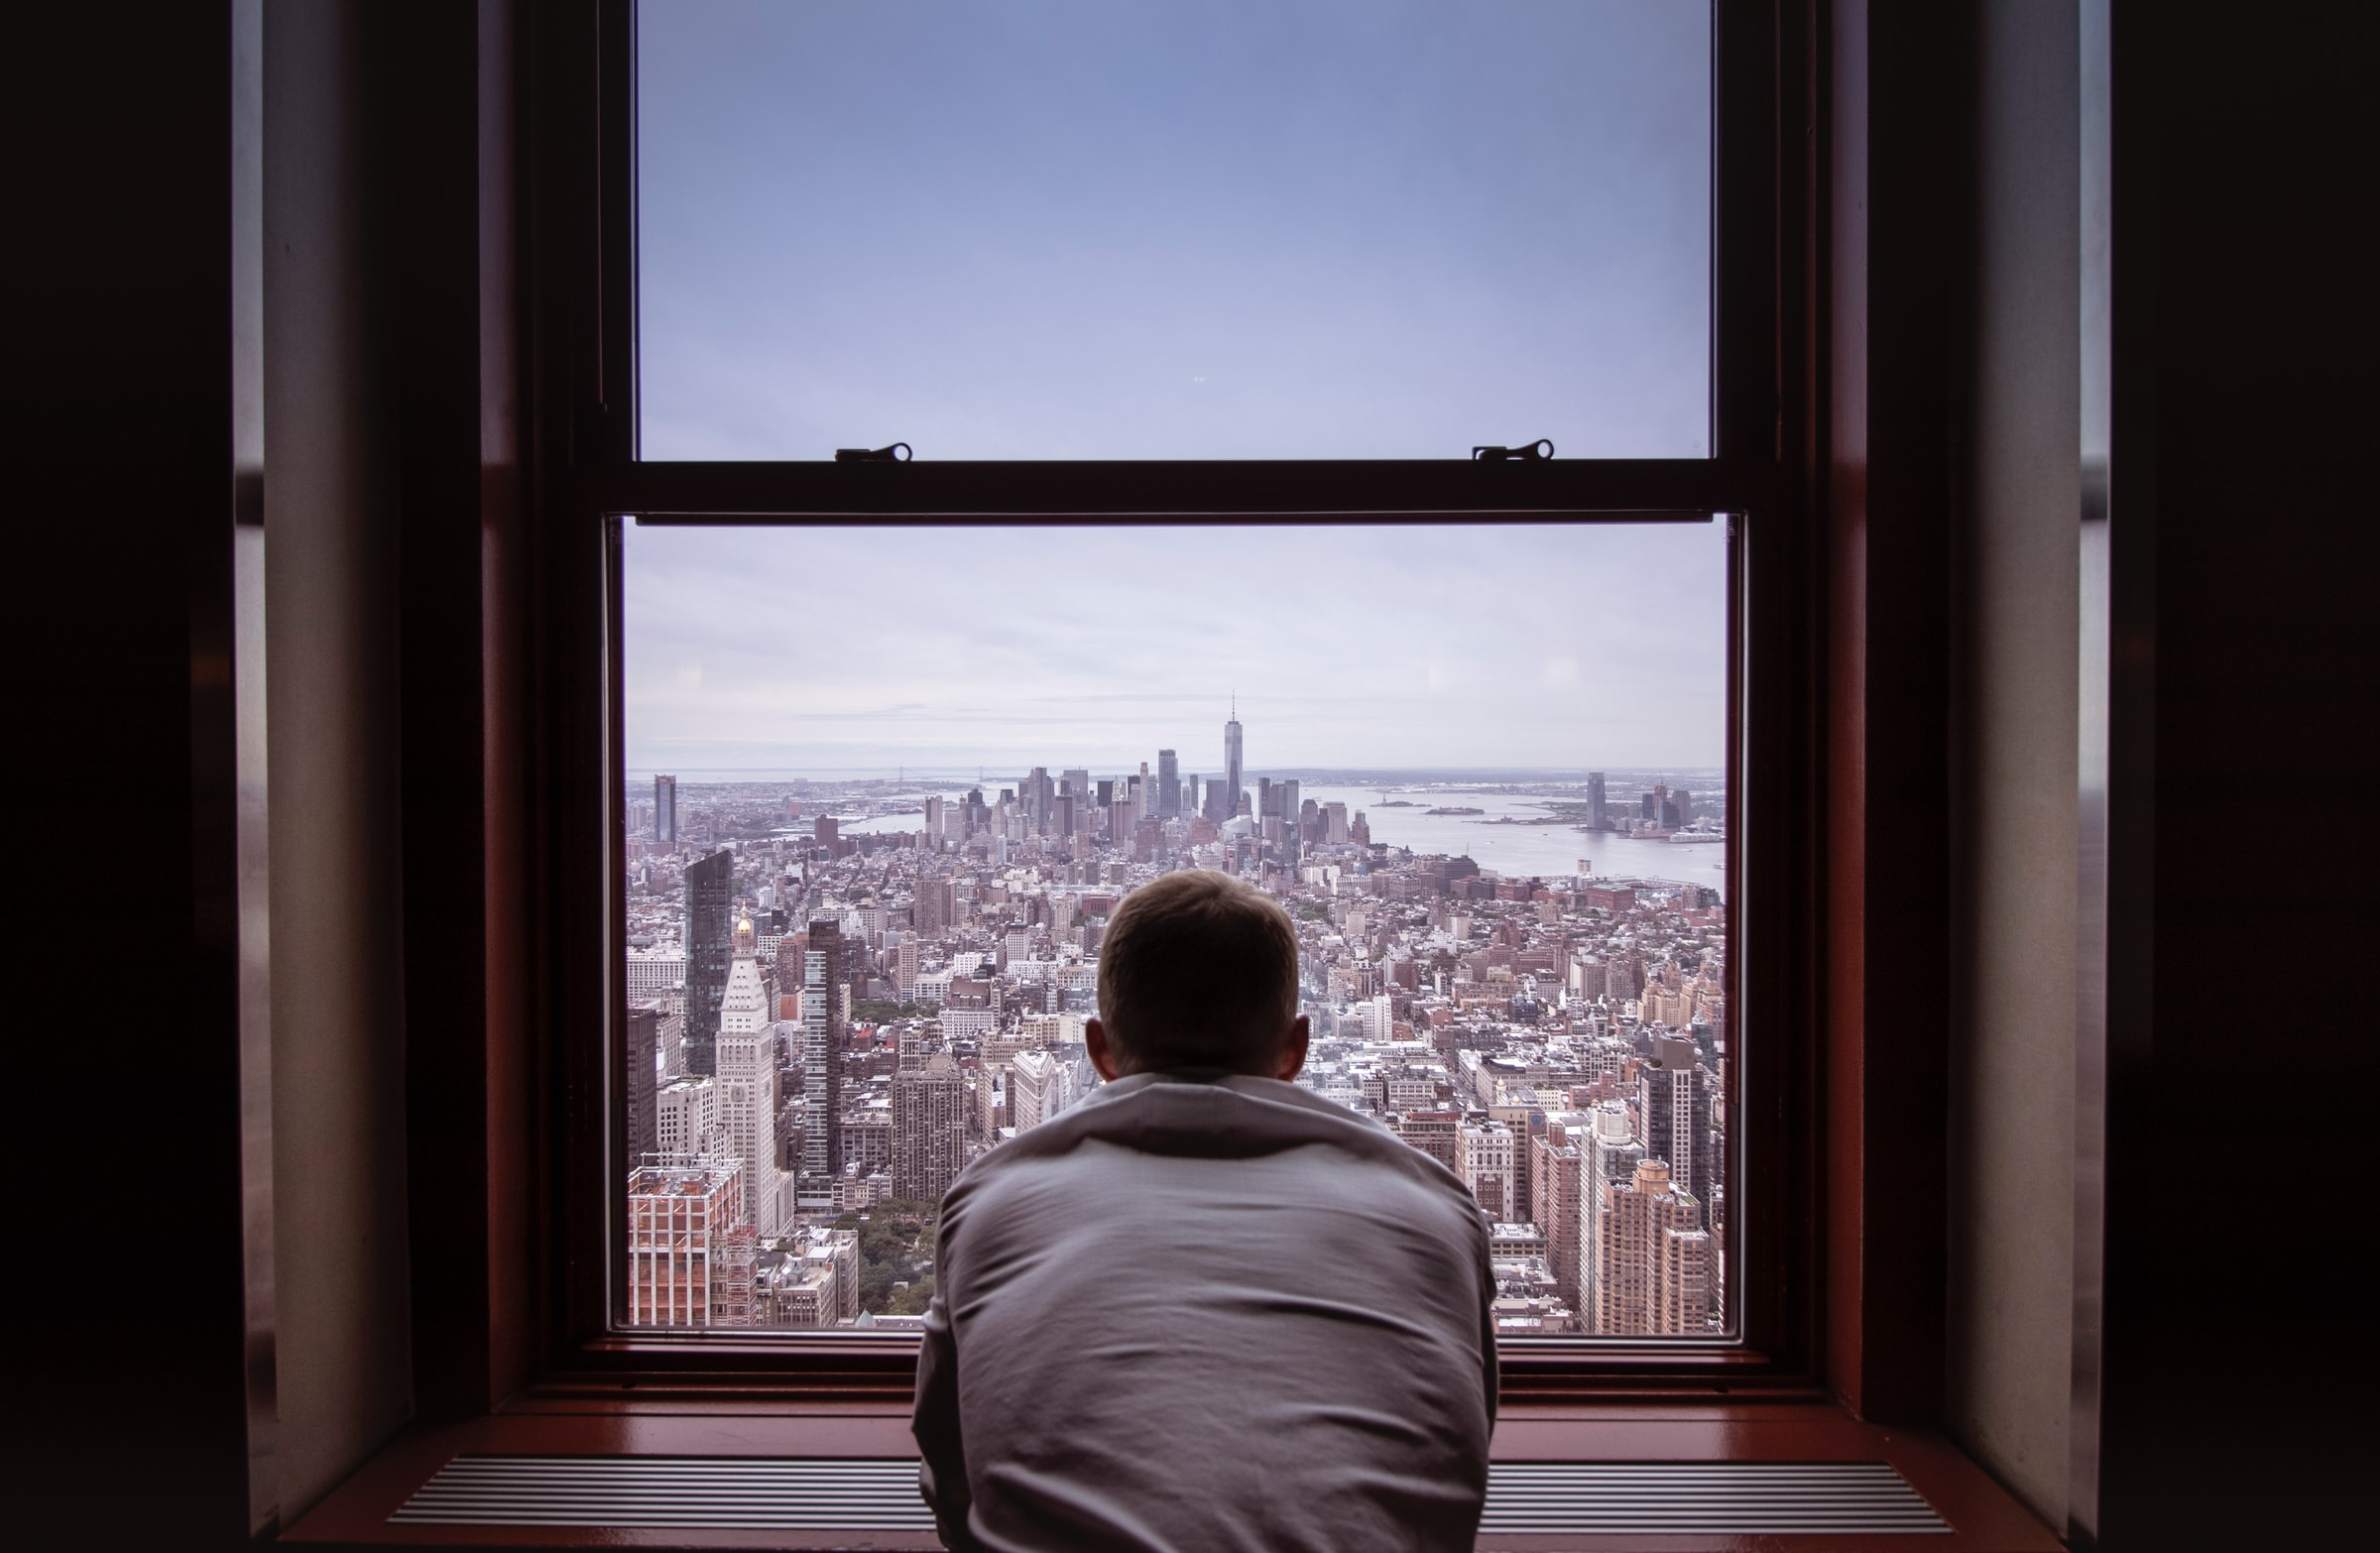 man window new york isolation